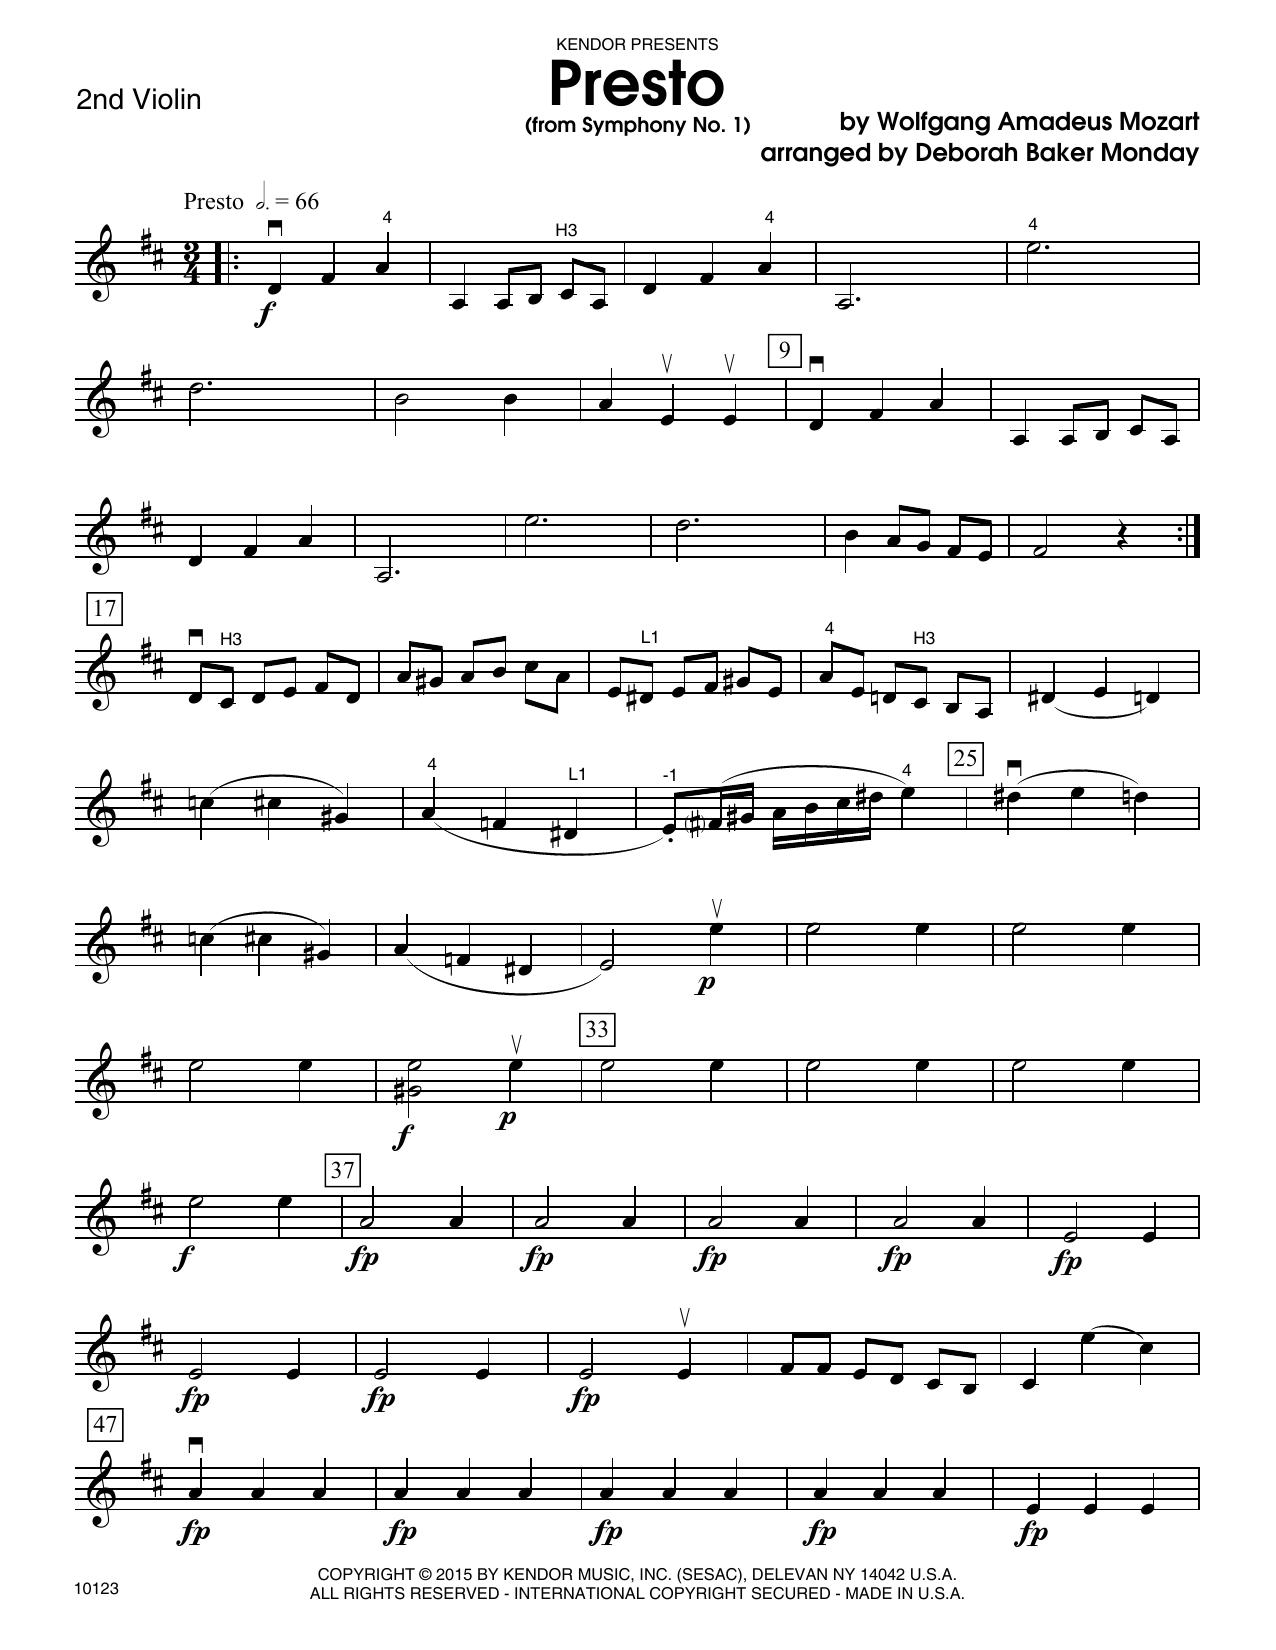 Deborah Baker Monday Presto (from Symphony No. 1) - 2nd Violin sheet music notes and chords. Download Printable PDF.